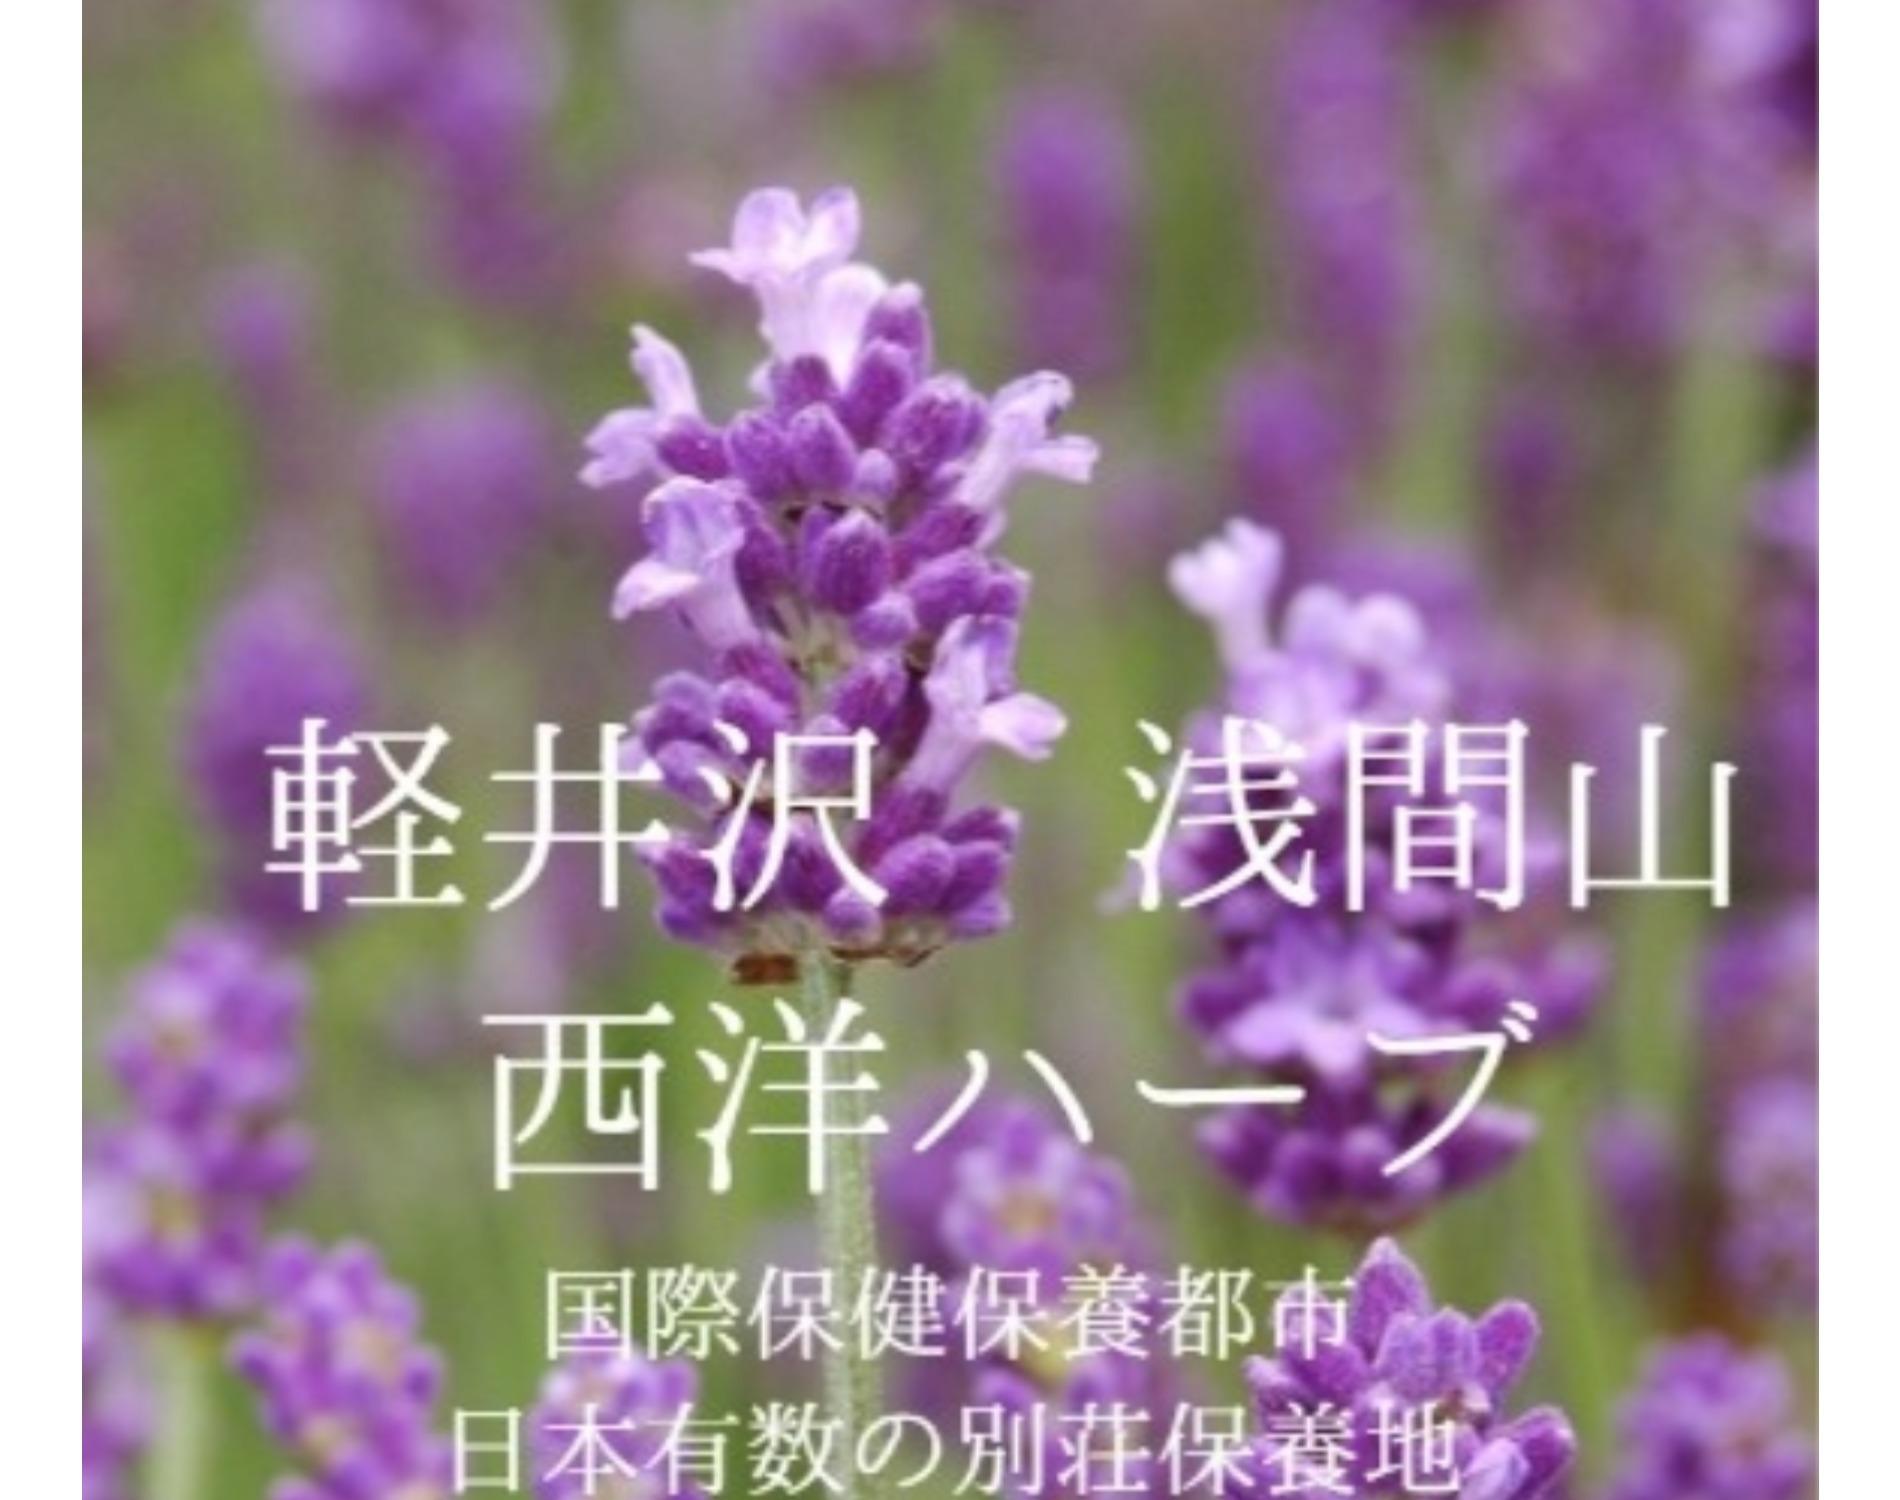 軽井沢西洋ハーブ